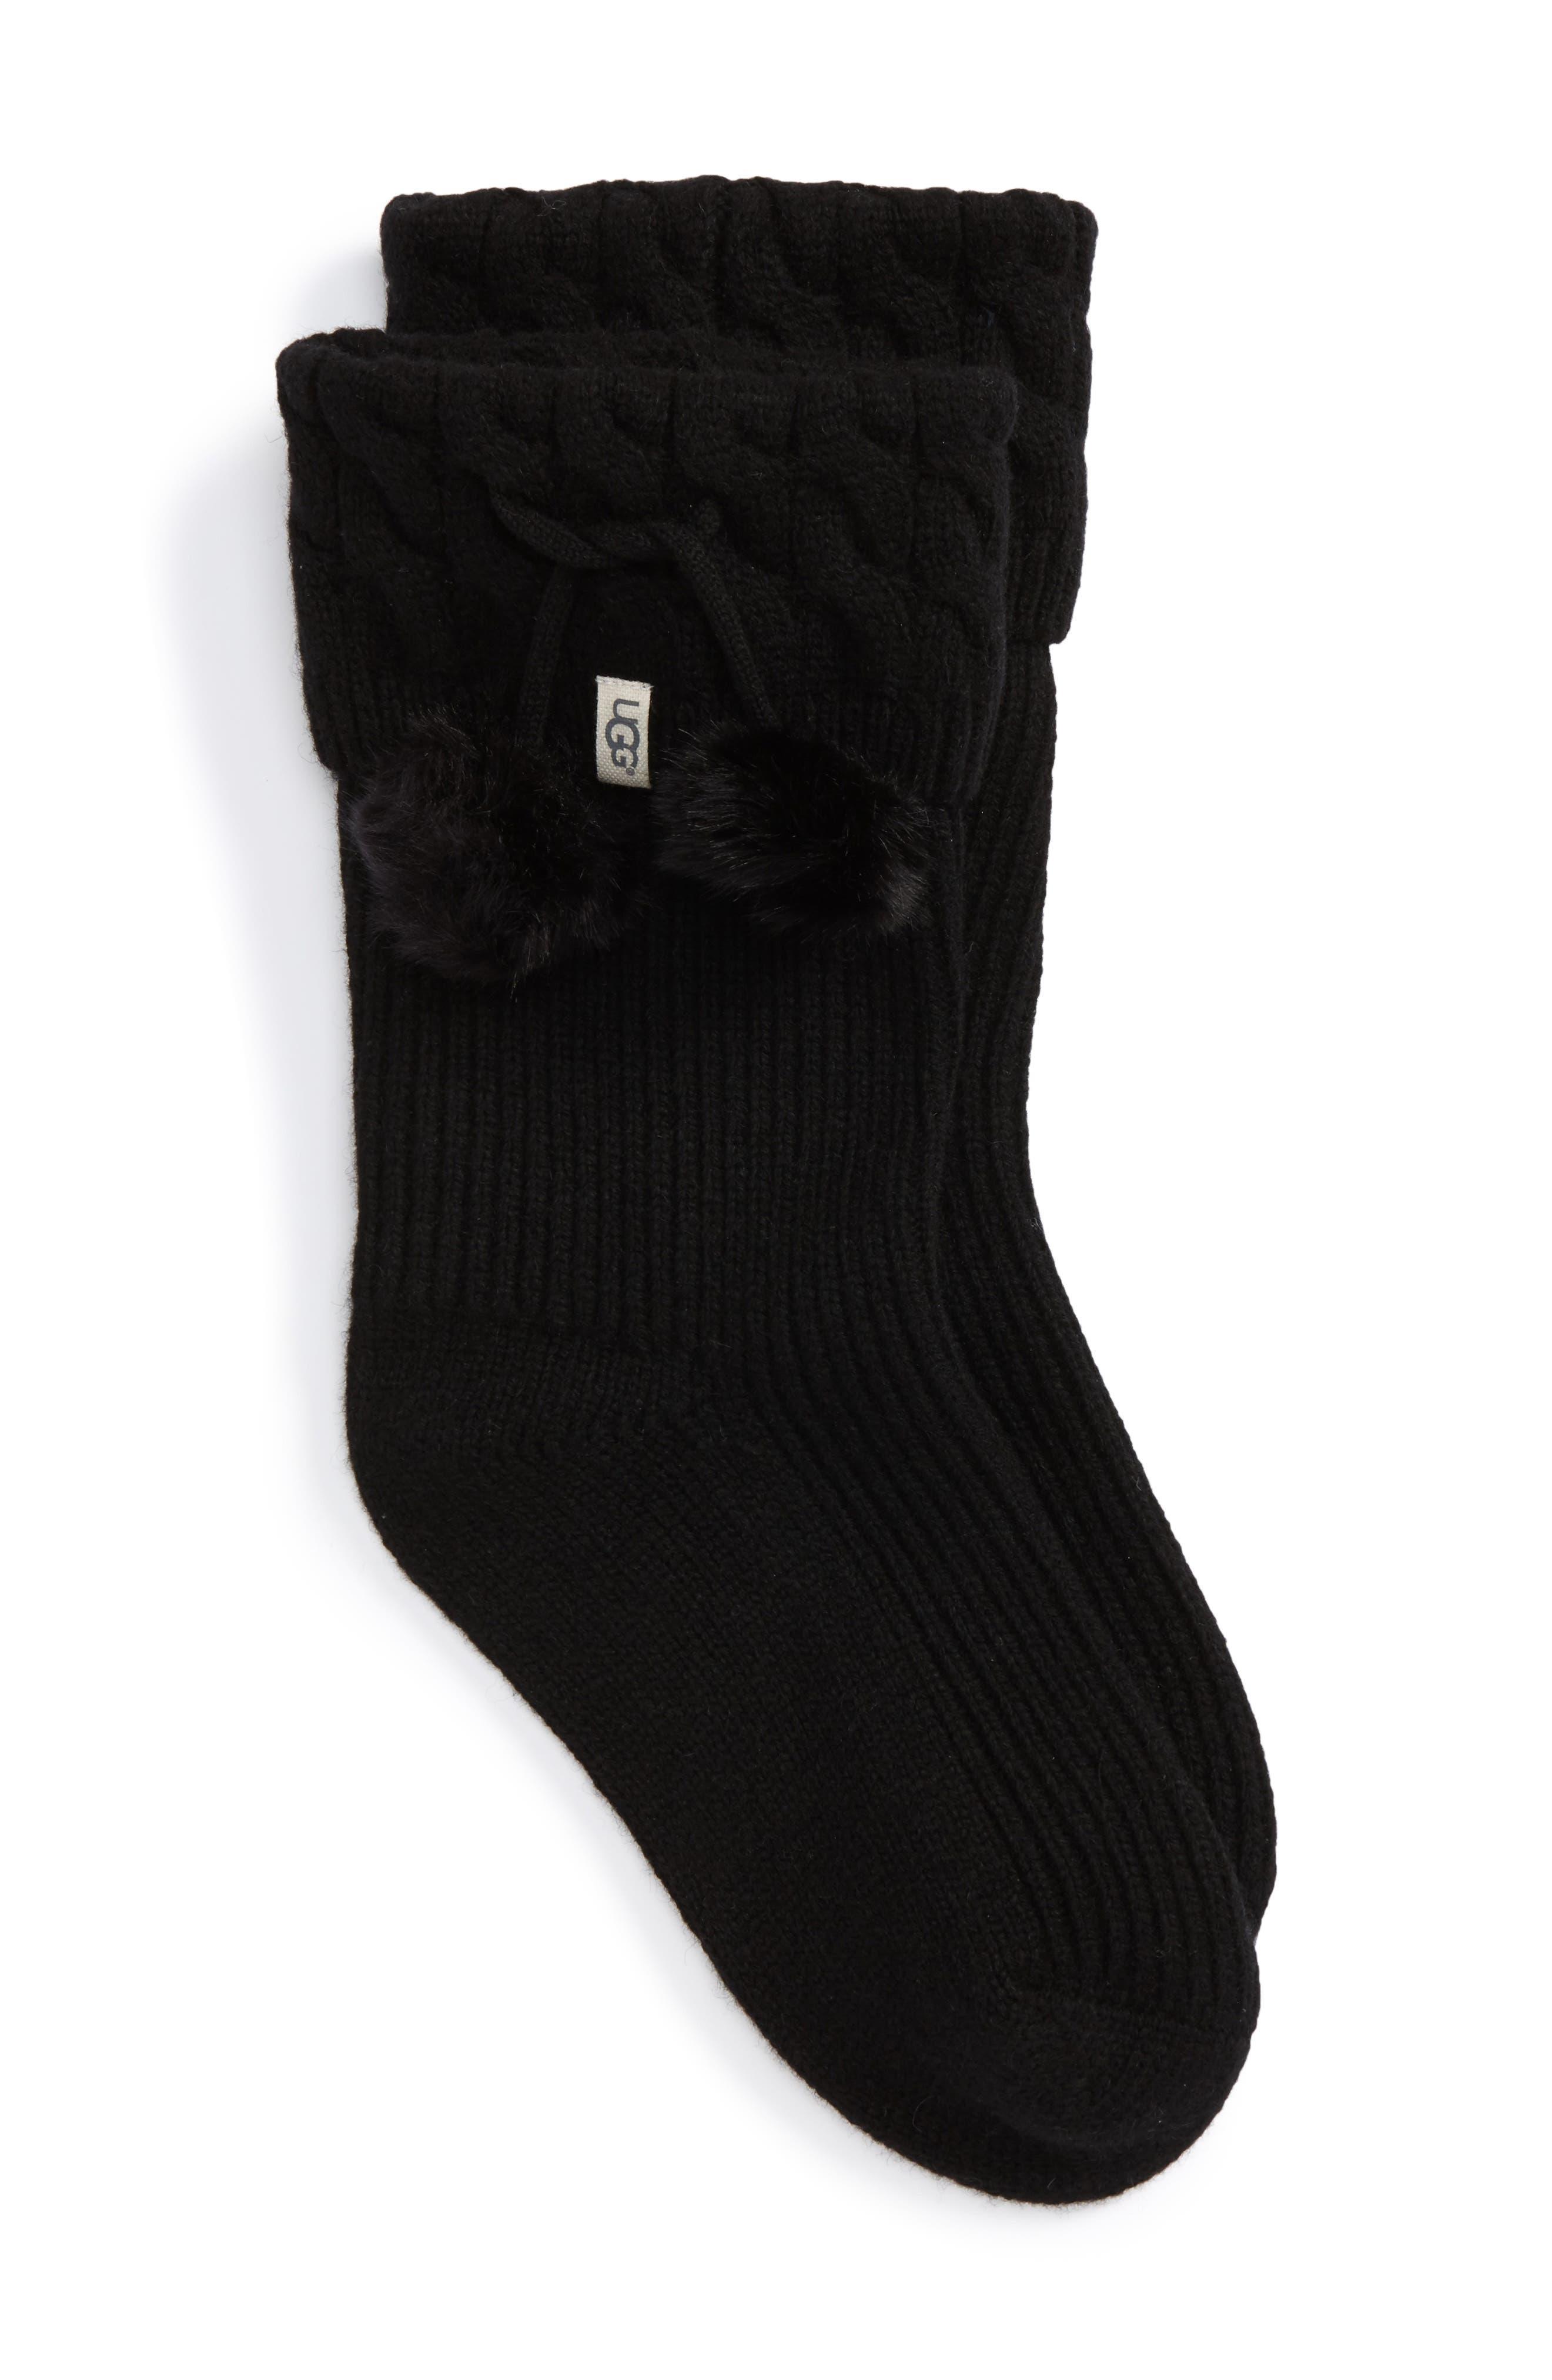 UGGpure<sup>™</sup> Pompom Short Rain Boot Sock, Main, color, 001